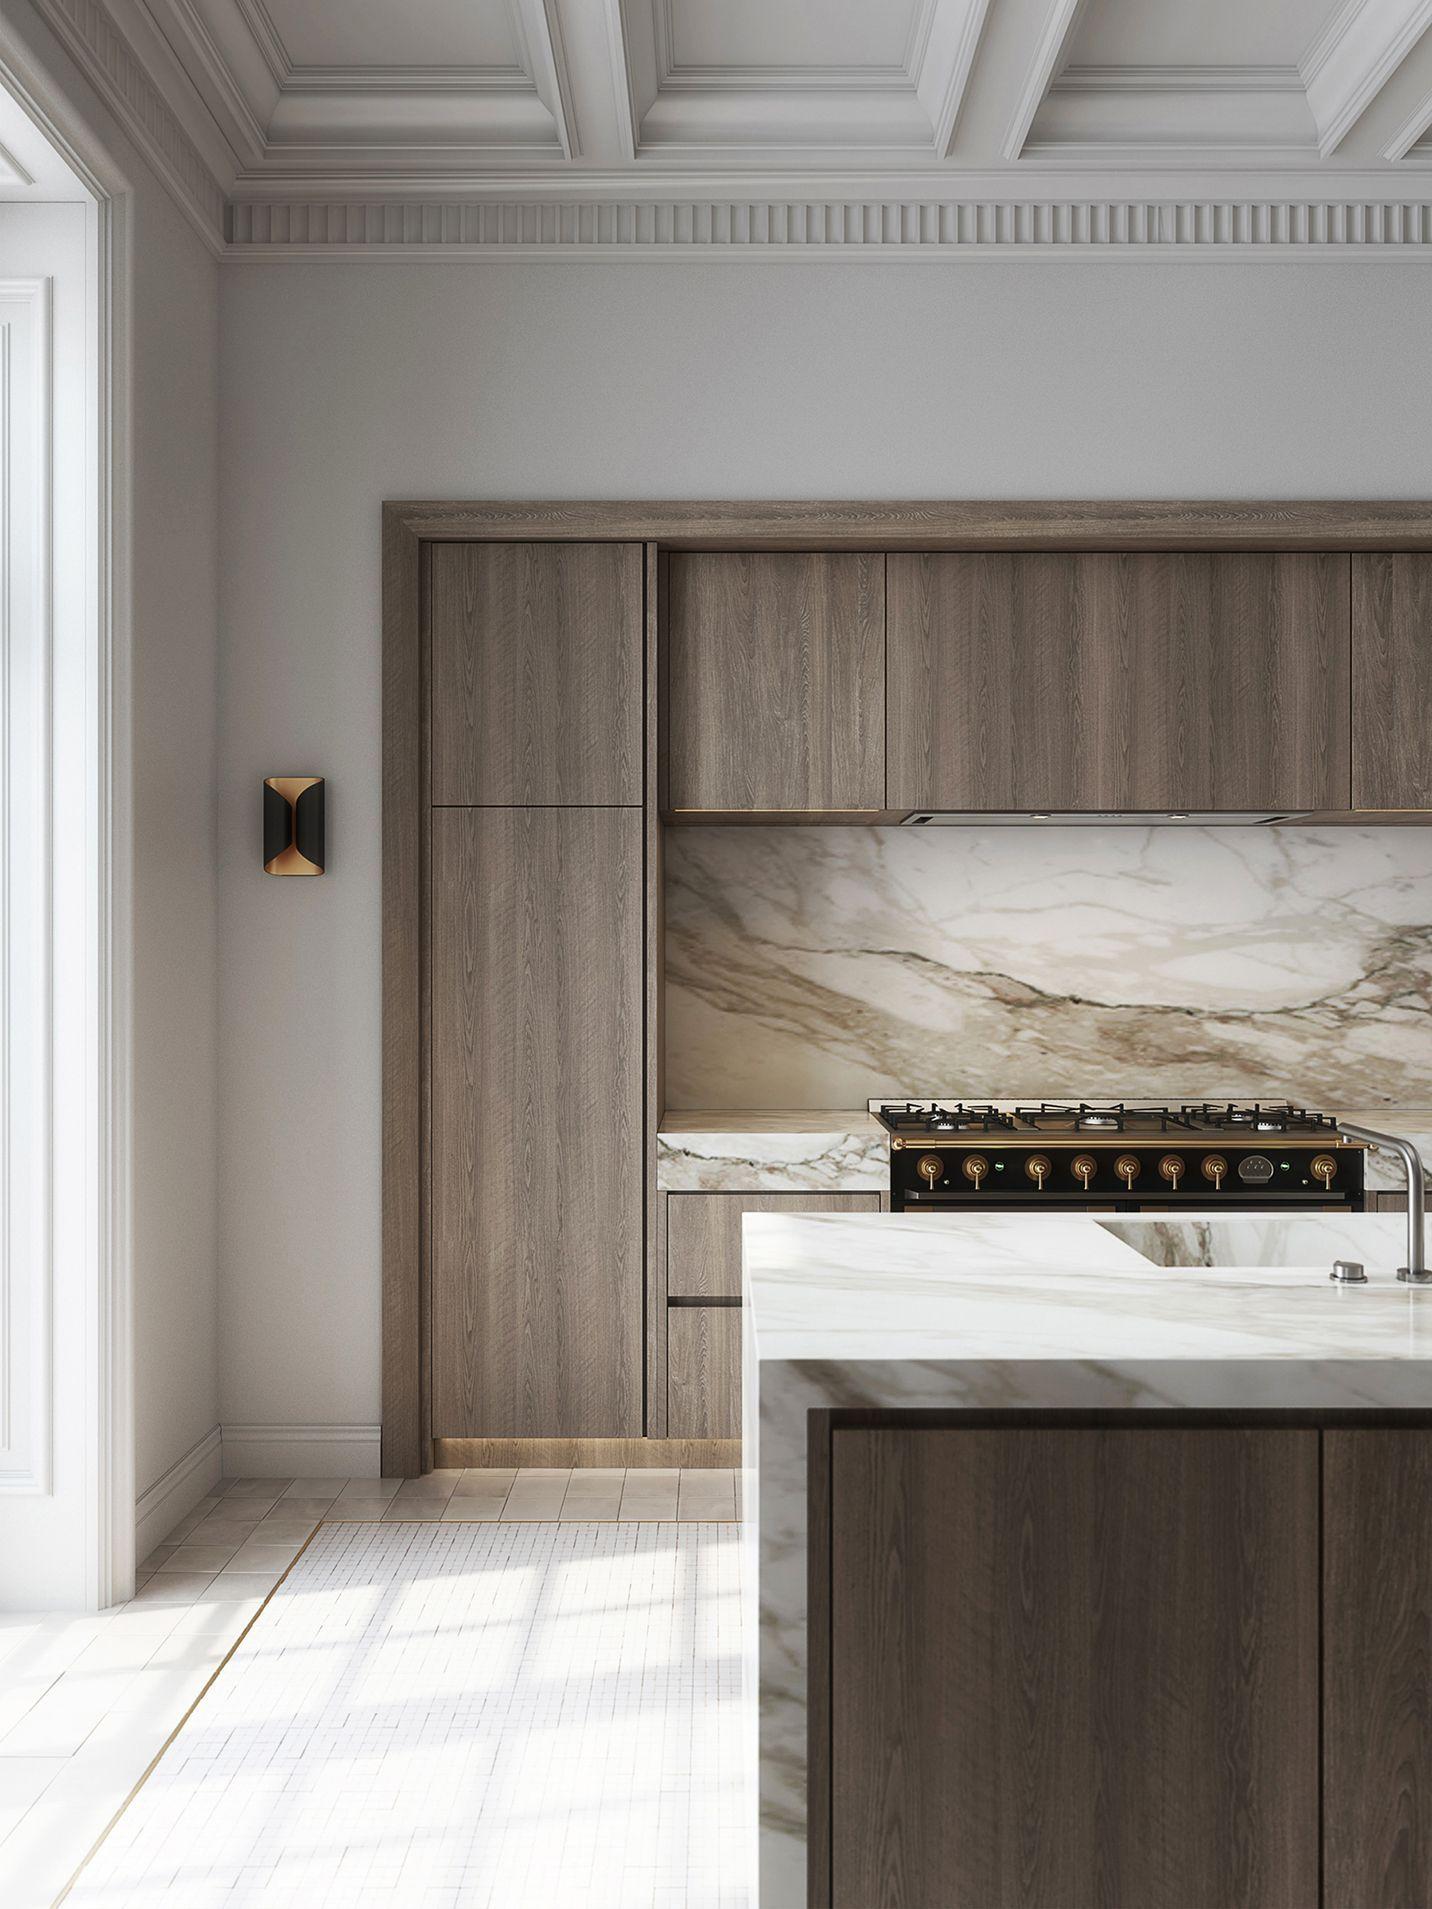 Indian Home Interior In 2020 Kitchen Design Trends Modern Kitchen Design House Interior